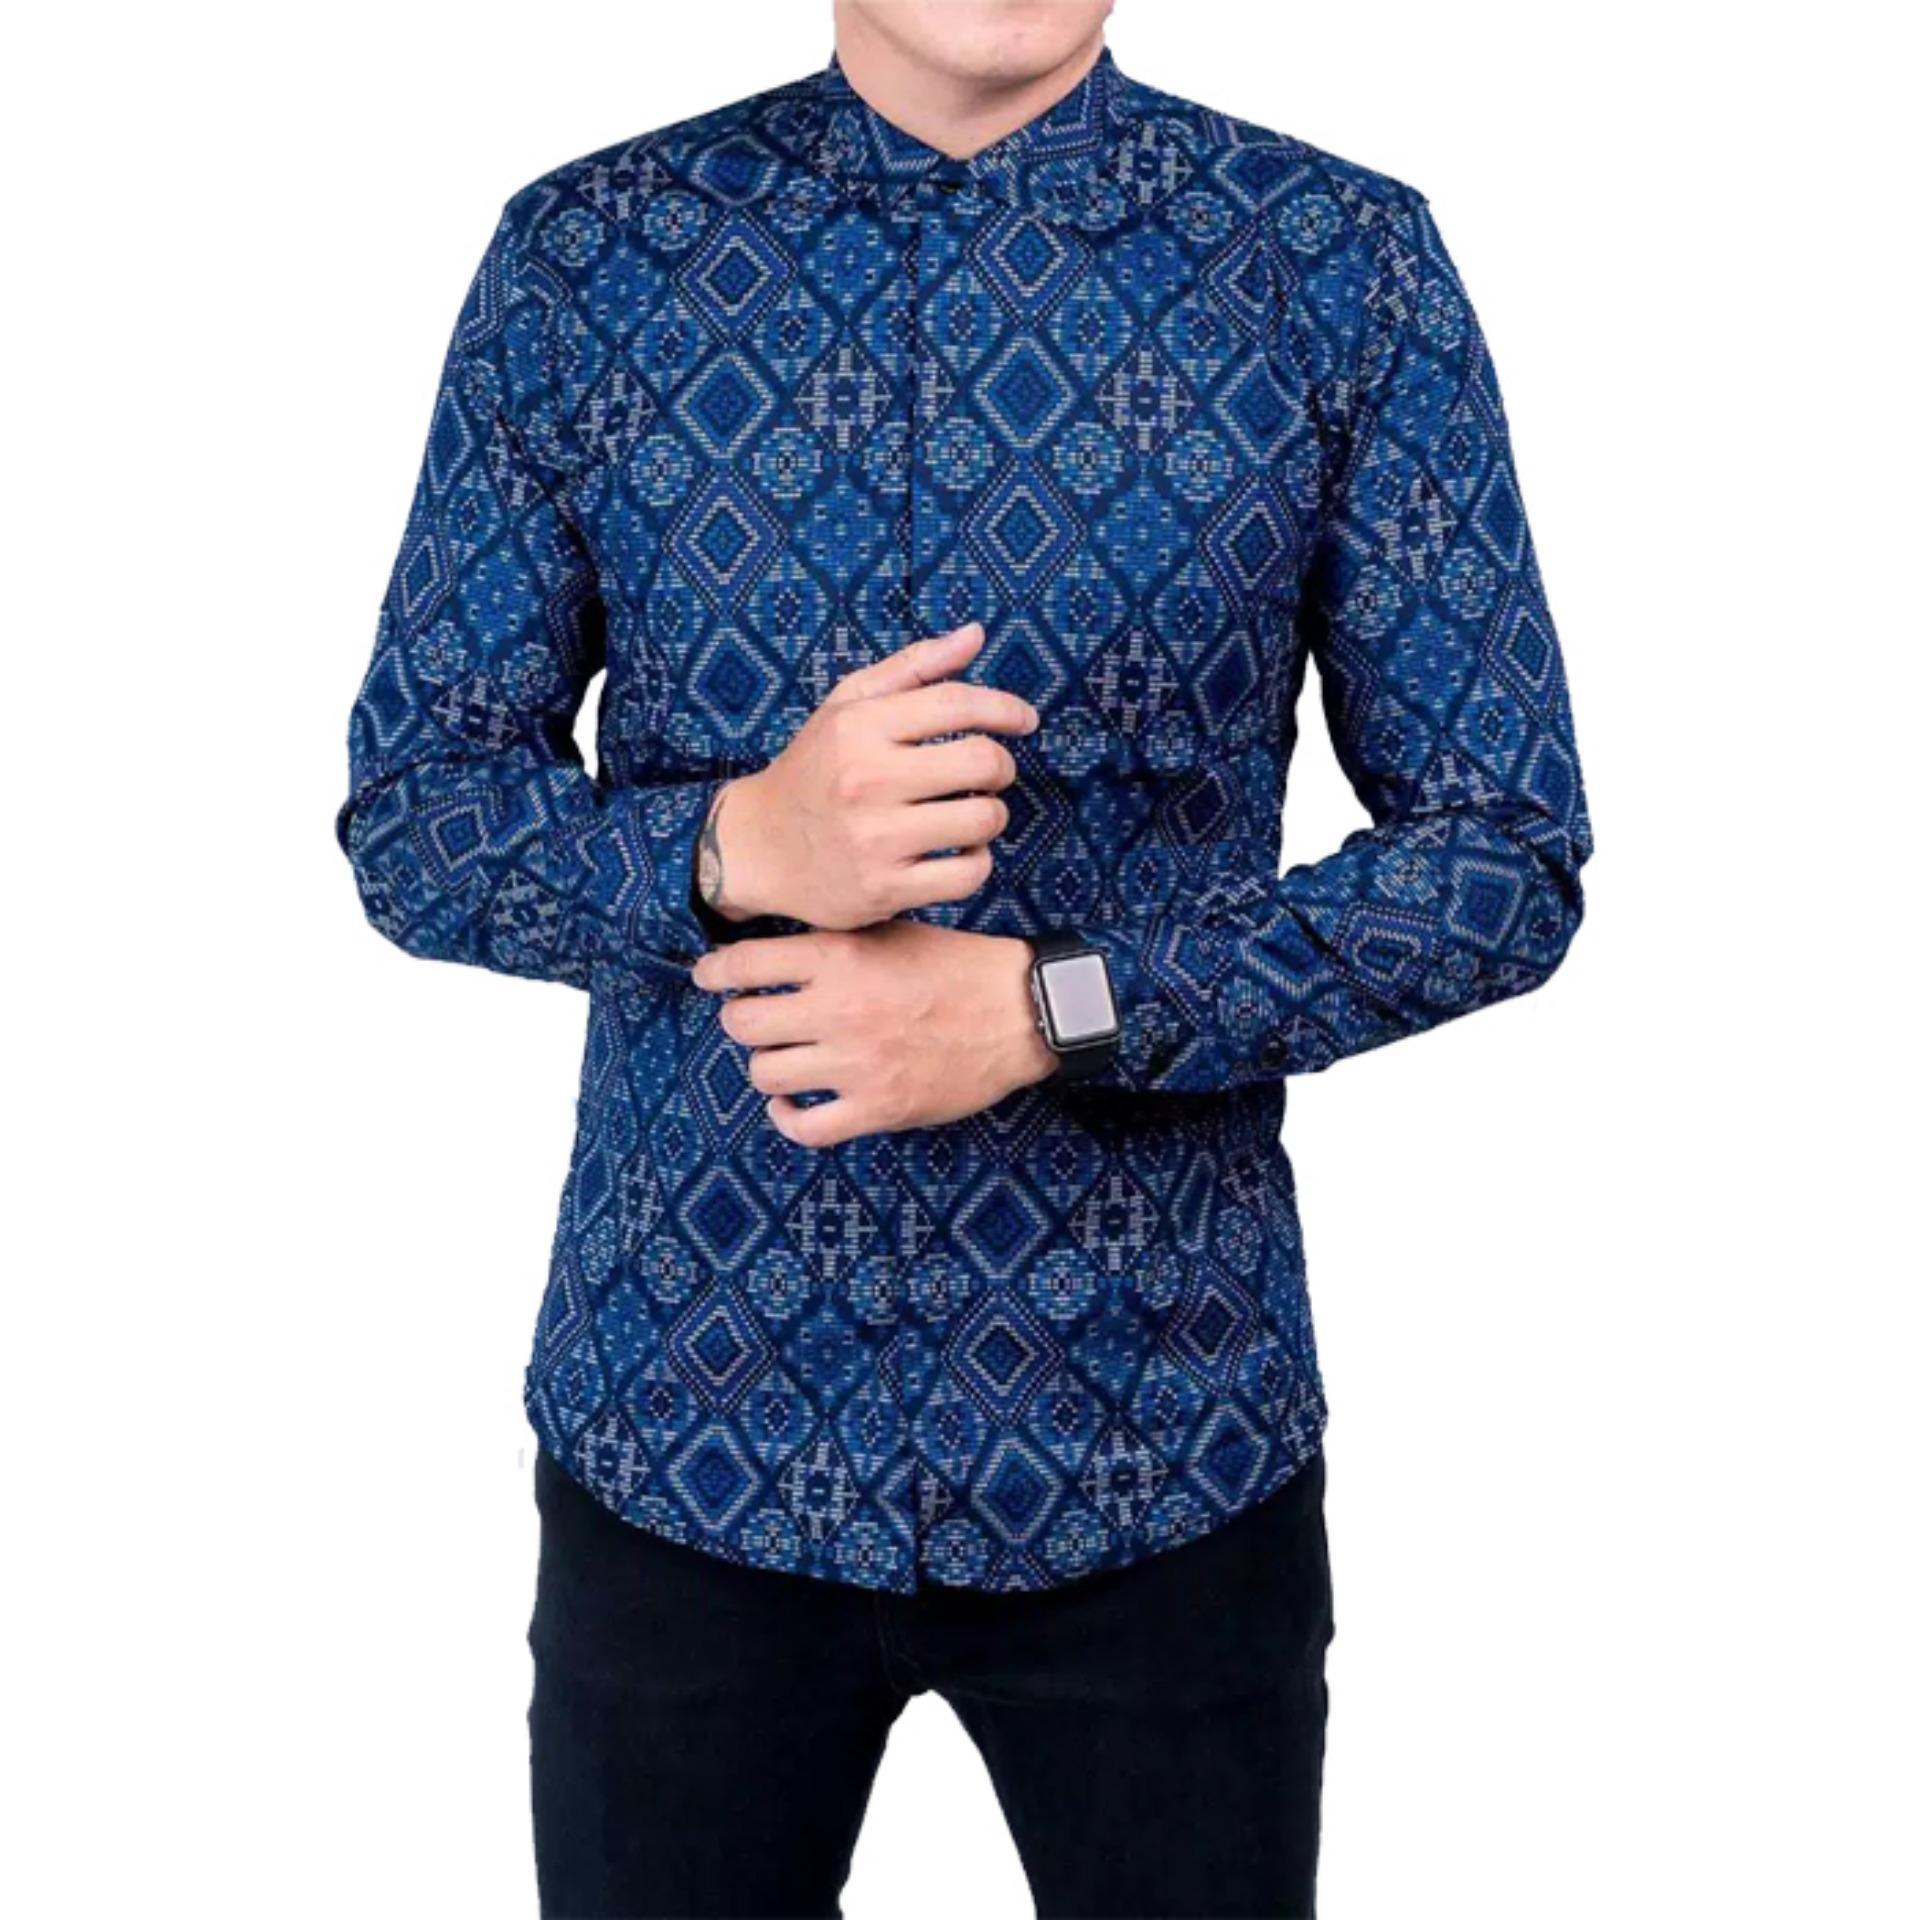 Batik Nagarihardja Kasual Motif Lereng Parang Kombinasi Coklat Produk Ukm Bumn Kembang Kemeja Songket Pria Lengan Panjang Baju Kerja Slimfit Diamond Navy Biru